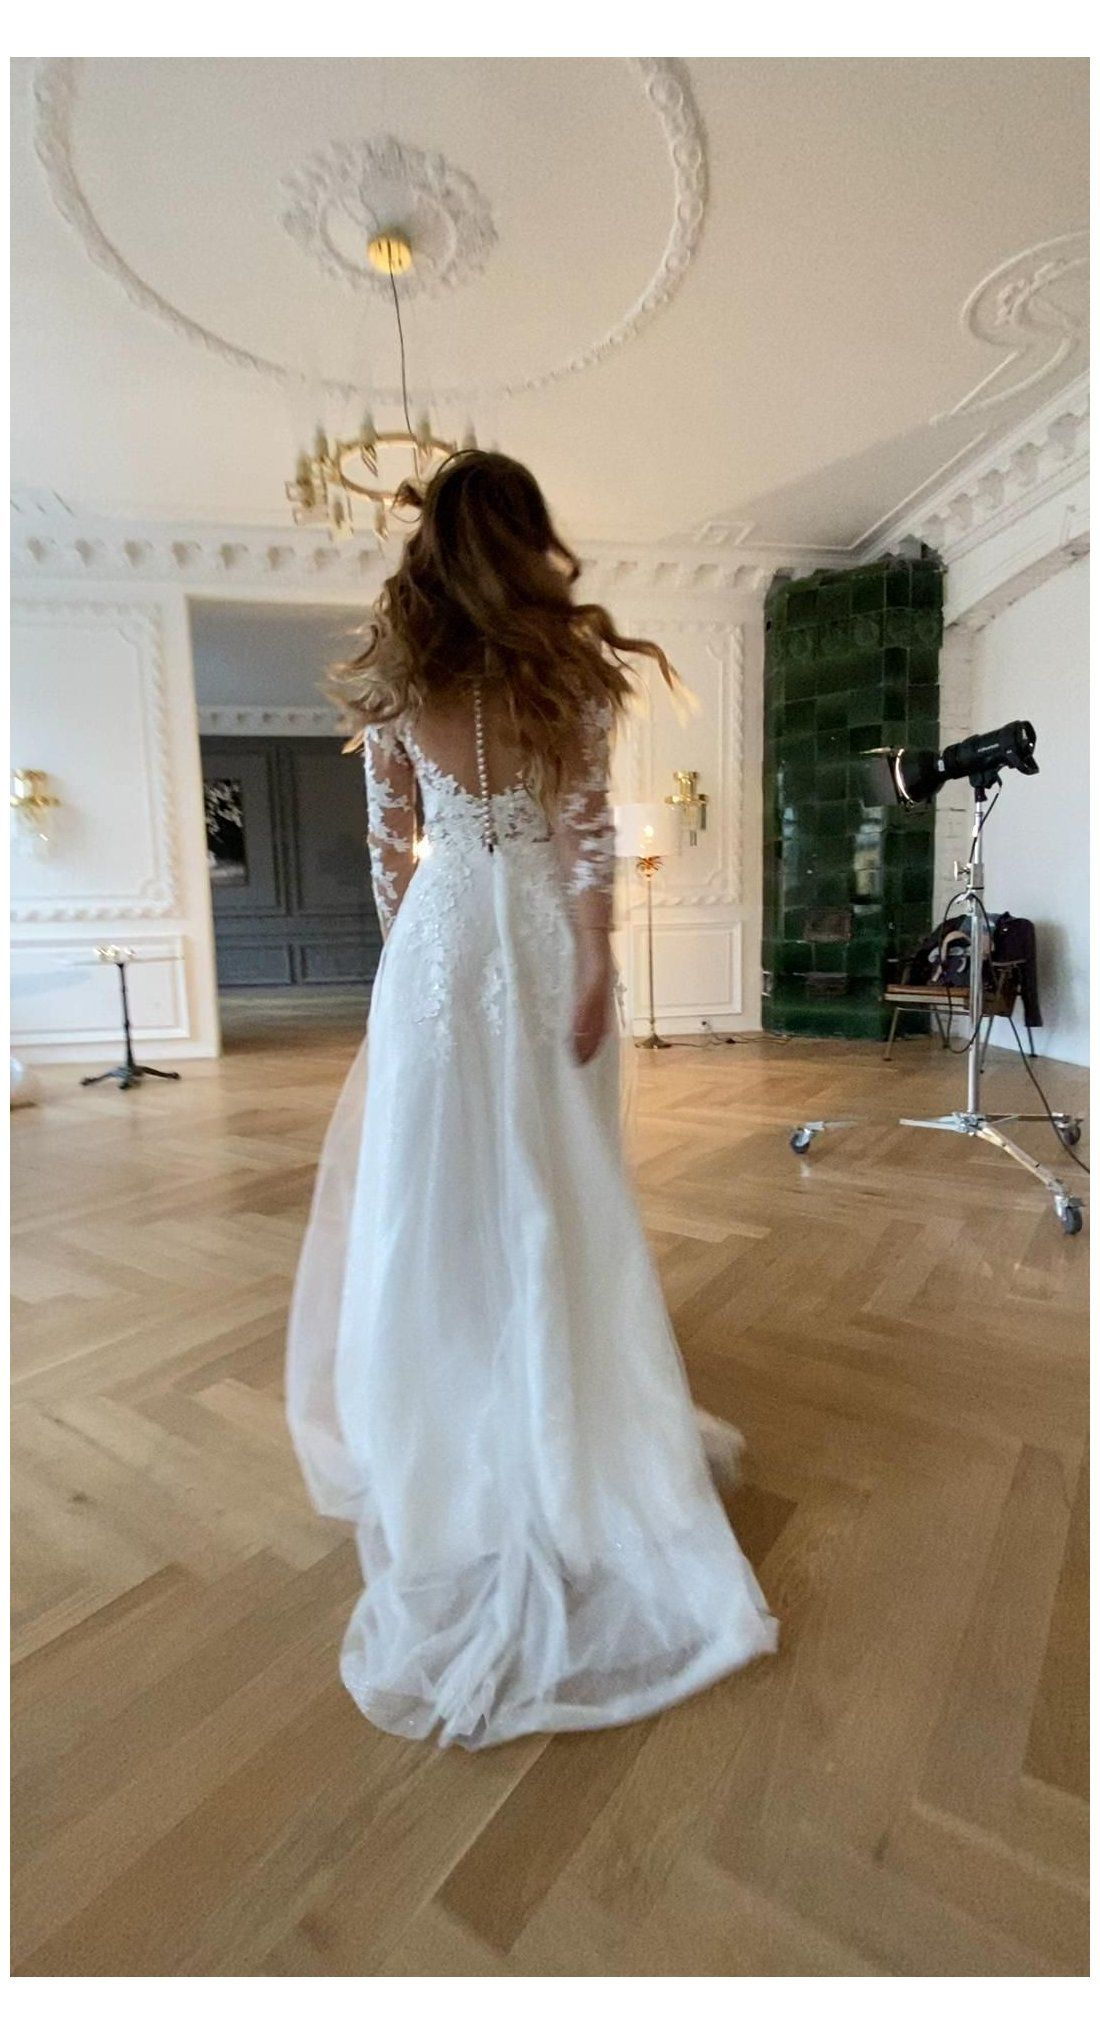 Wedding Dress Enn With Long Sleeves Satin Wedding Dress Simple Wedding Dre Elegant Wedding Dresses Lace Summer Wedding Dress Long Sleeve Wedding Dress Lace [ 2034 x 1100 Pixel ]